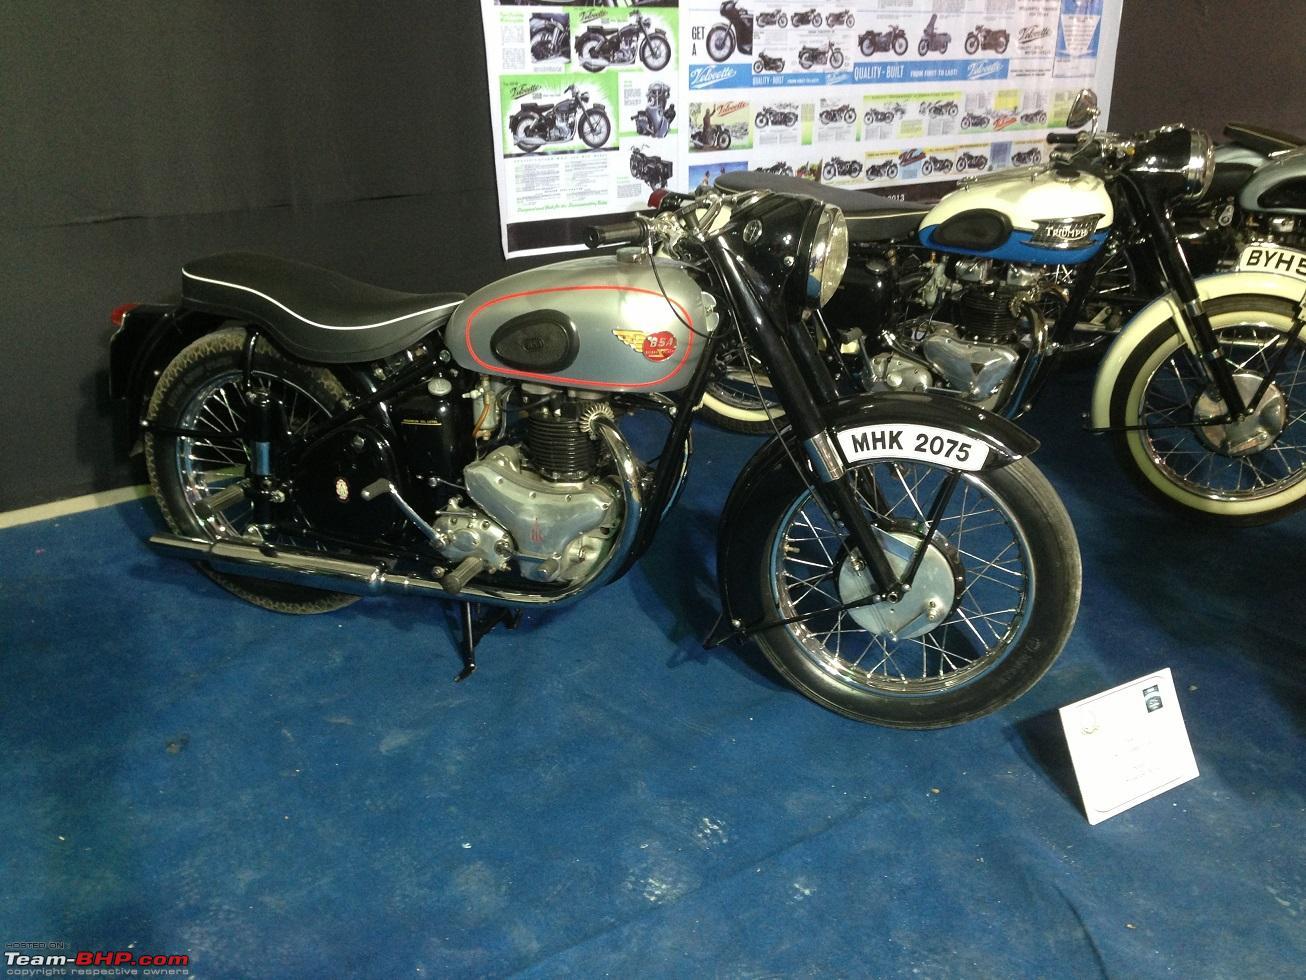 Vintage bike display at india superbike festival pune bsa02 jpg